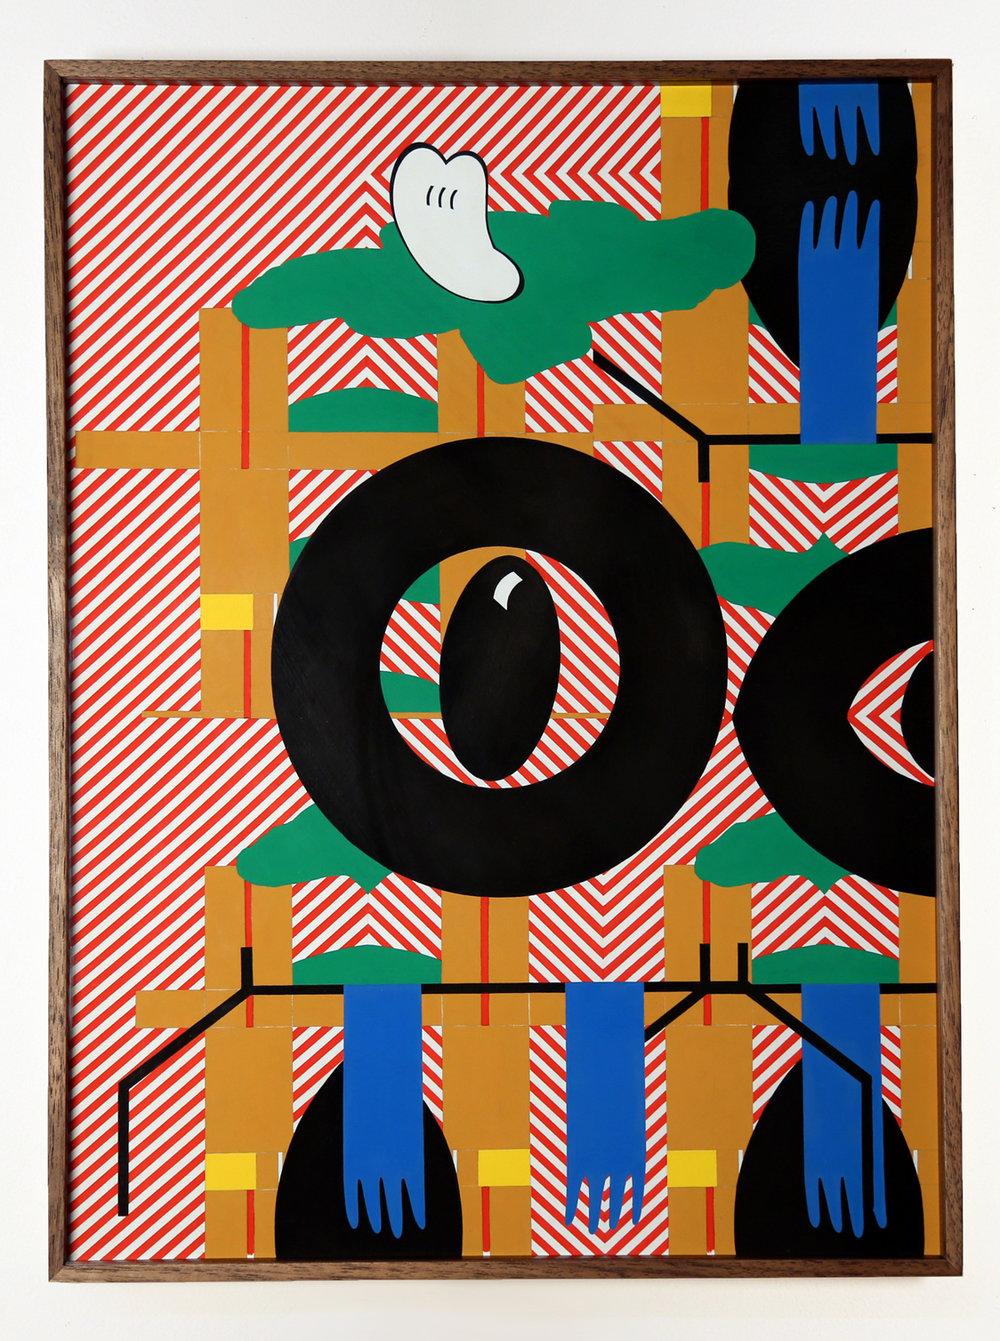 Lauren Davis Fisher   Hazard Rack Tire and Tongue  2019 Gouache on Paper (Walnut Frame) 53.3 x 40.6 cm  Available